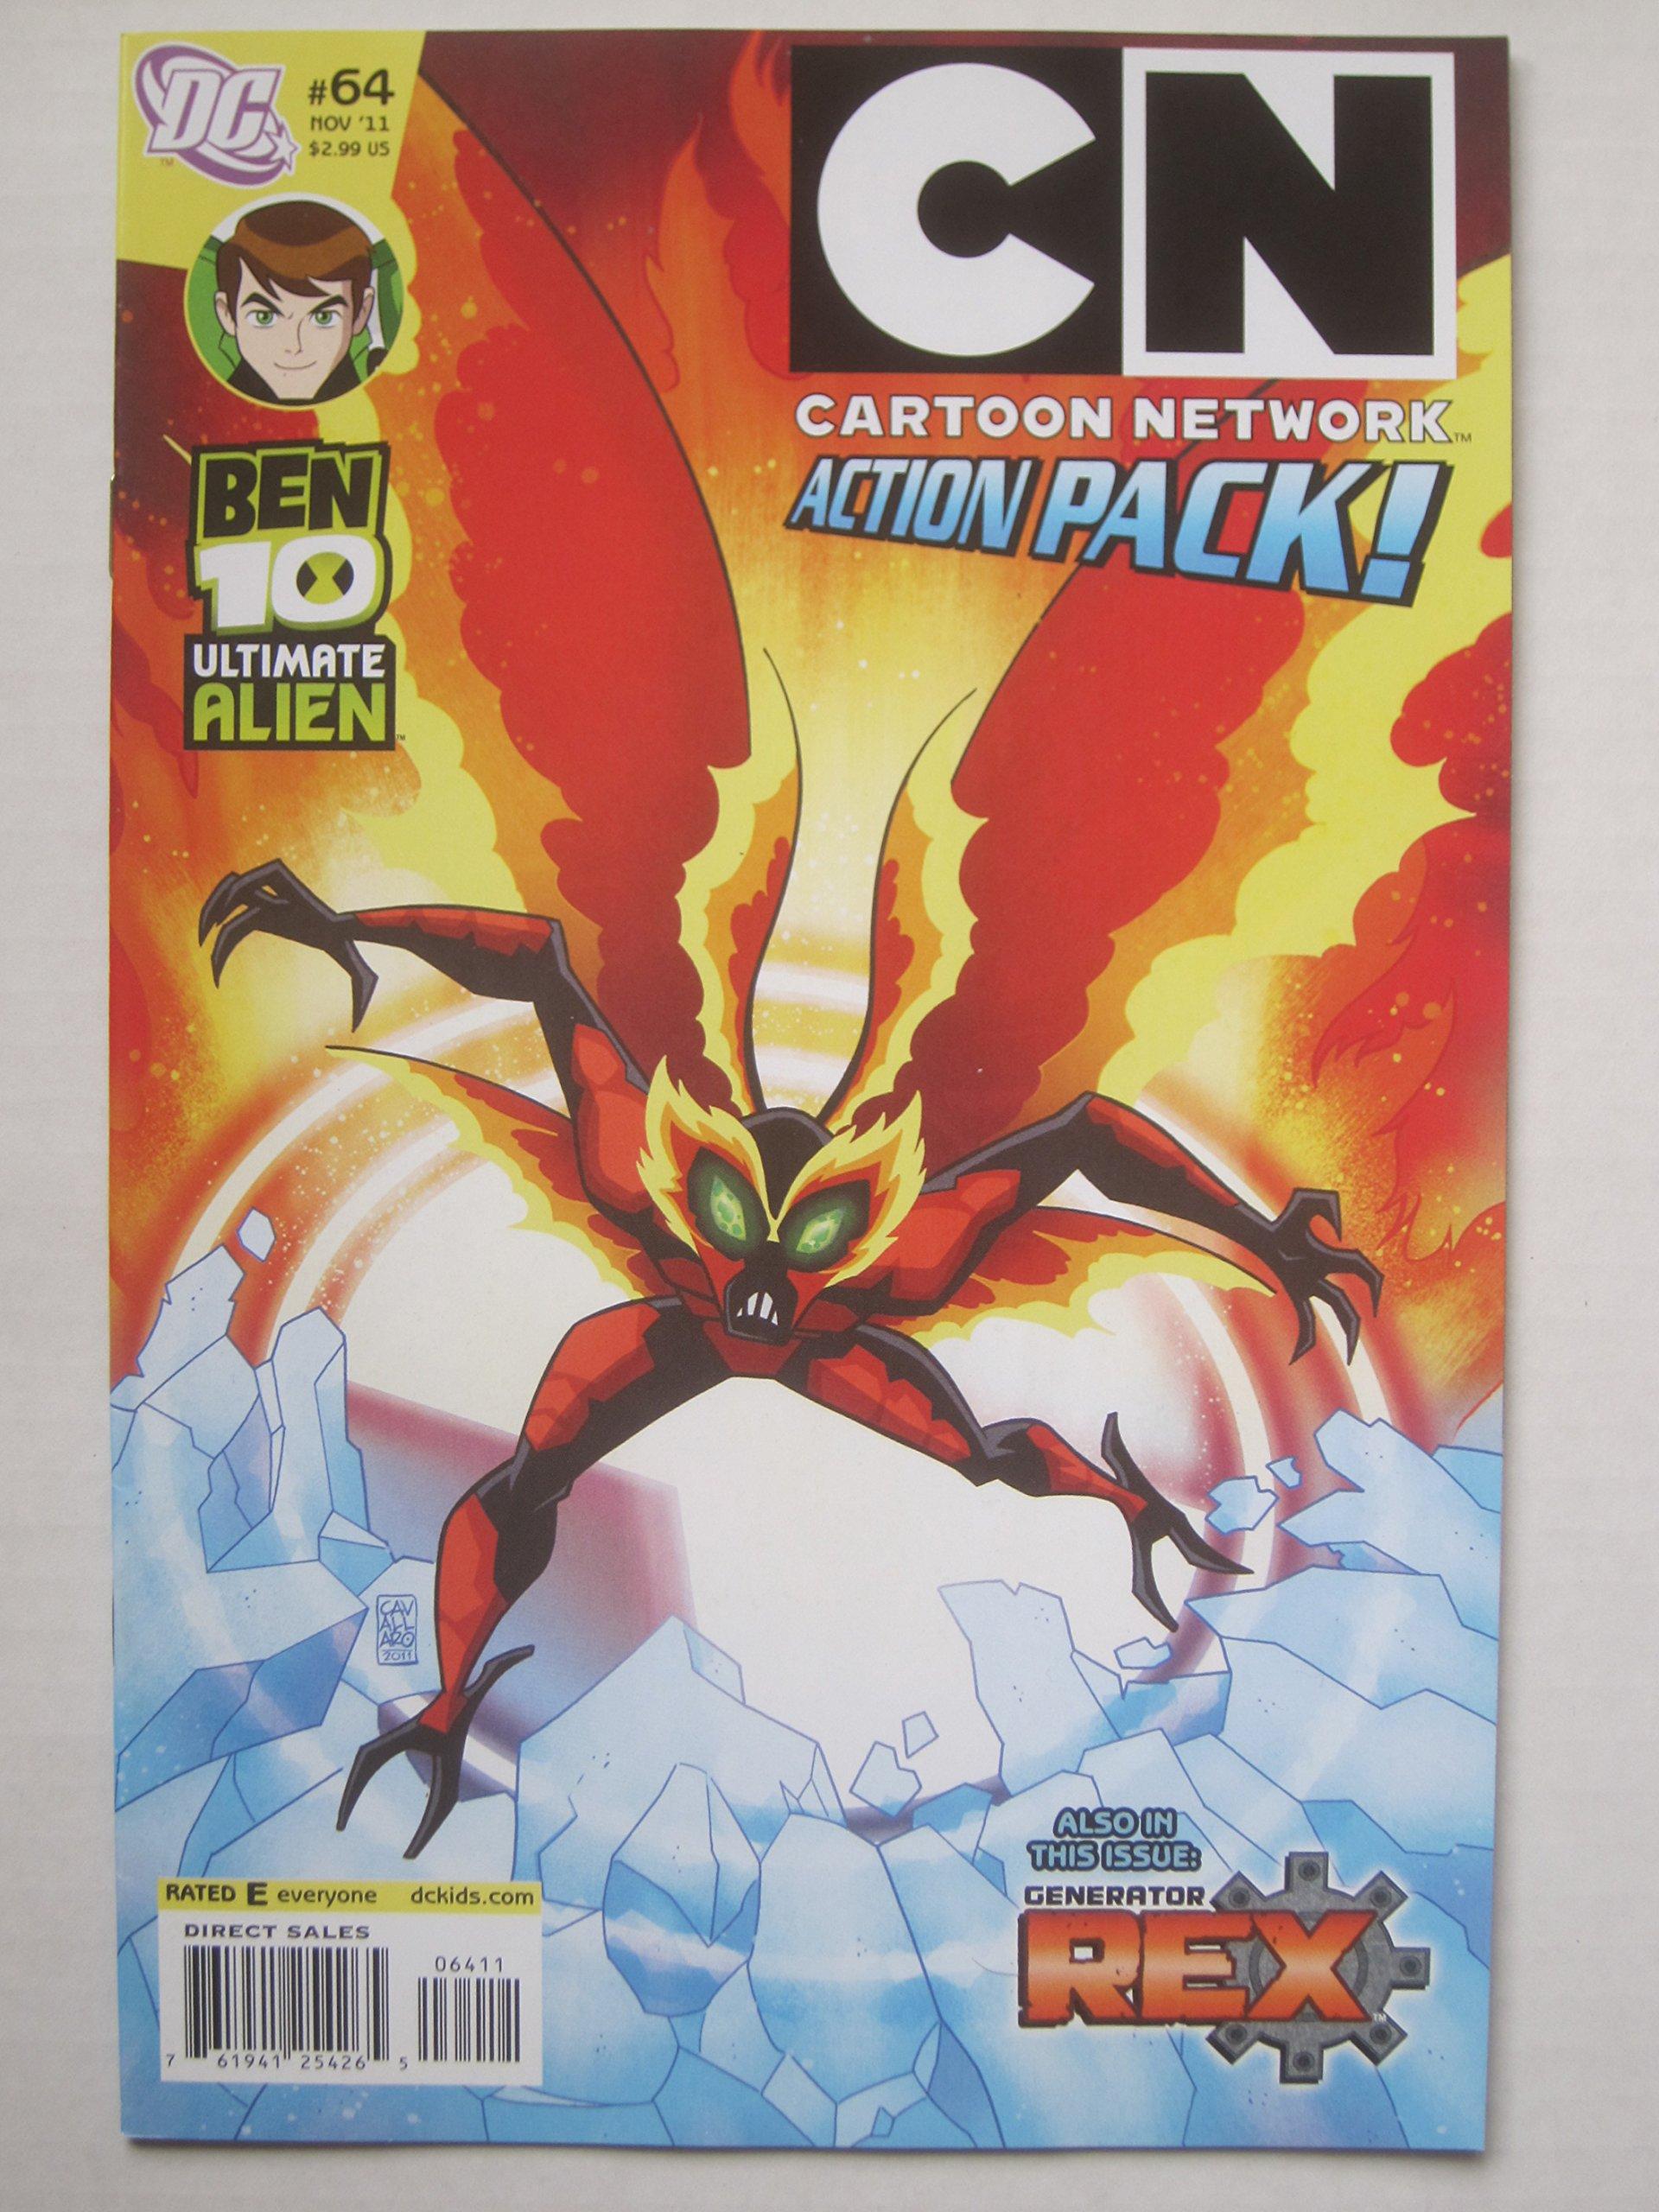 Cartoon Network Action Pack #64, November 2011 pdf epub